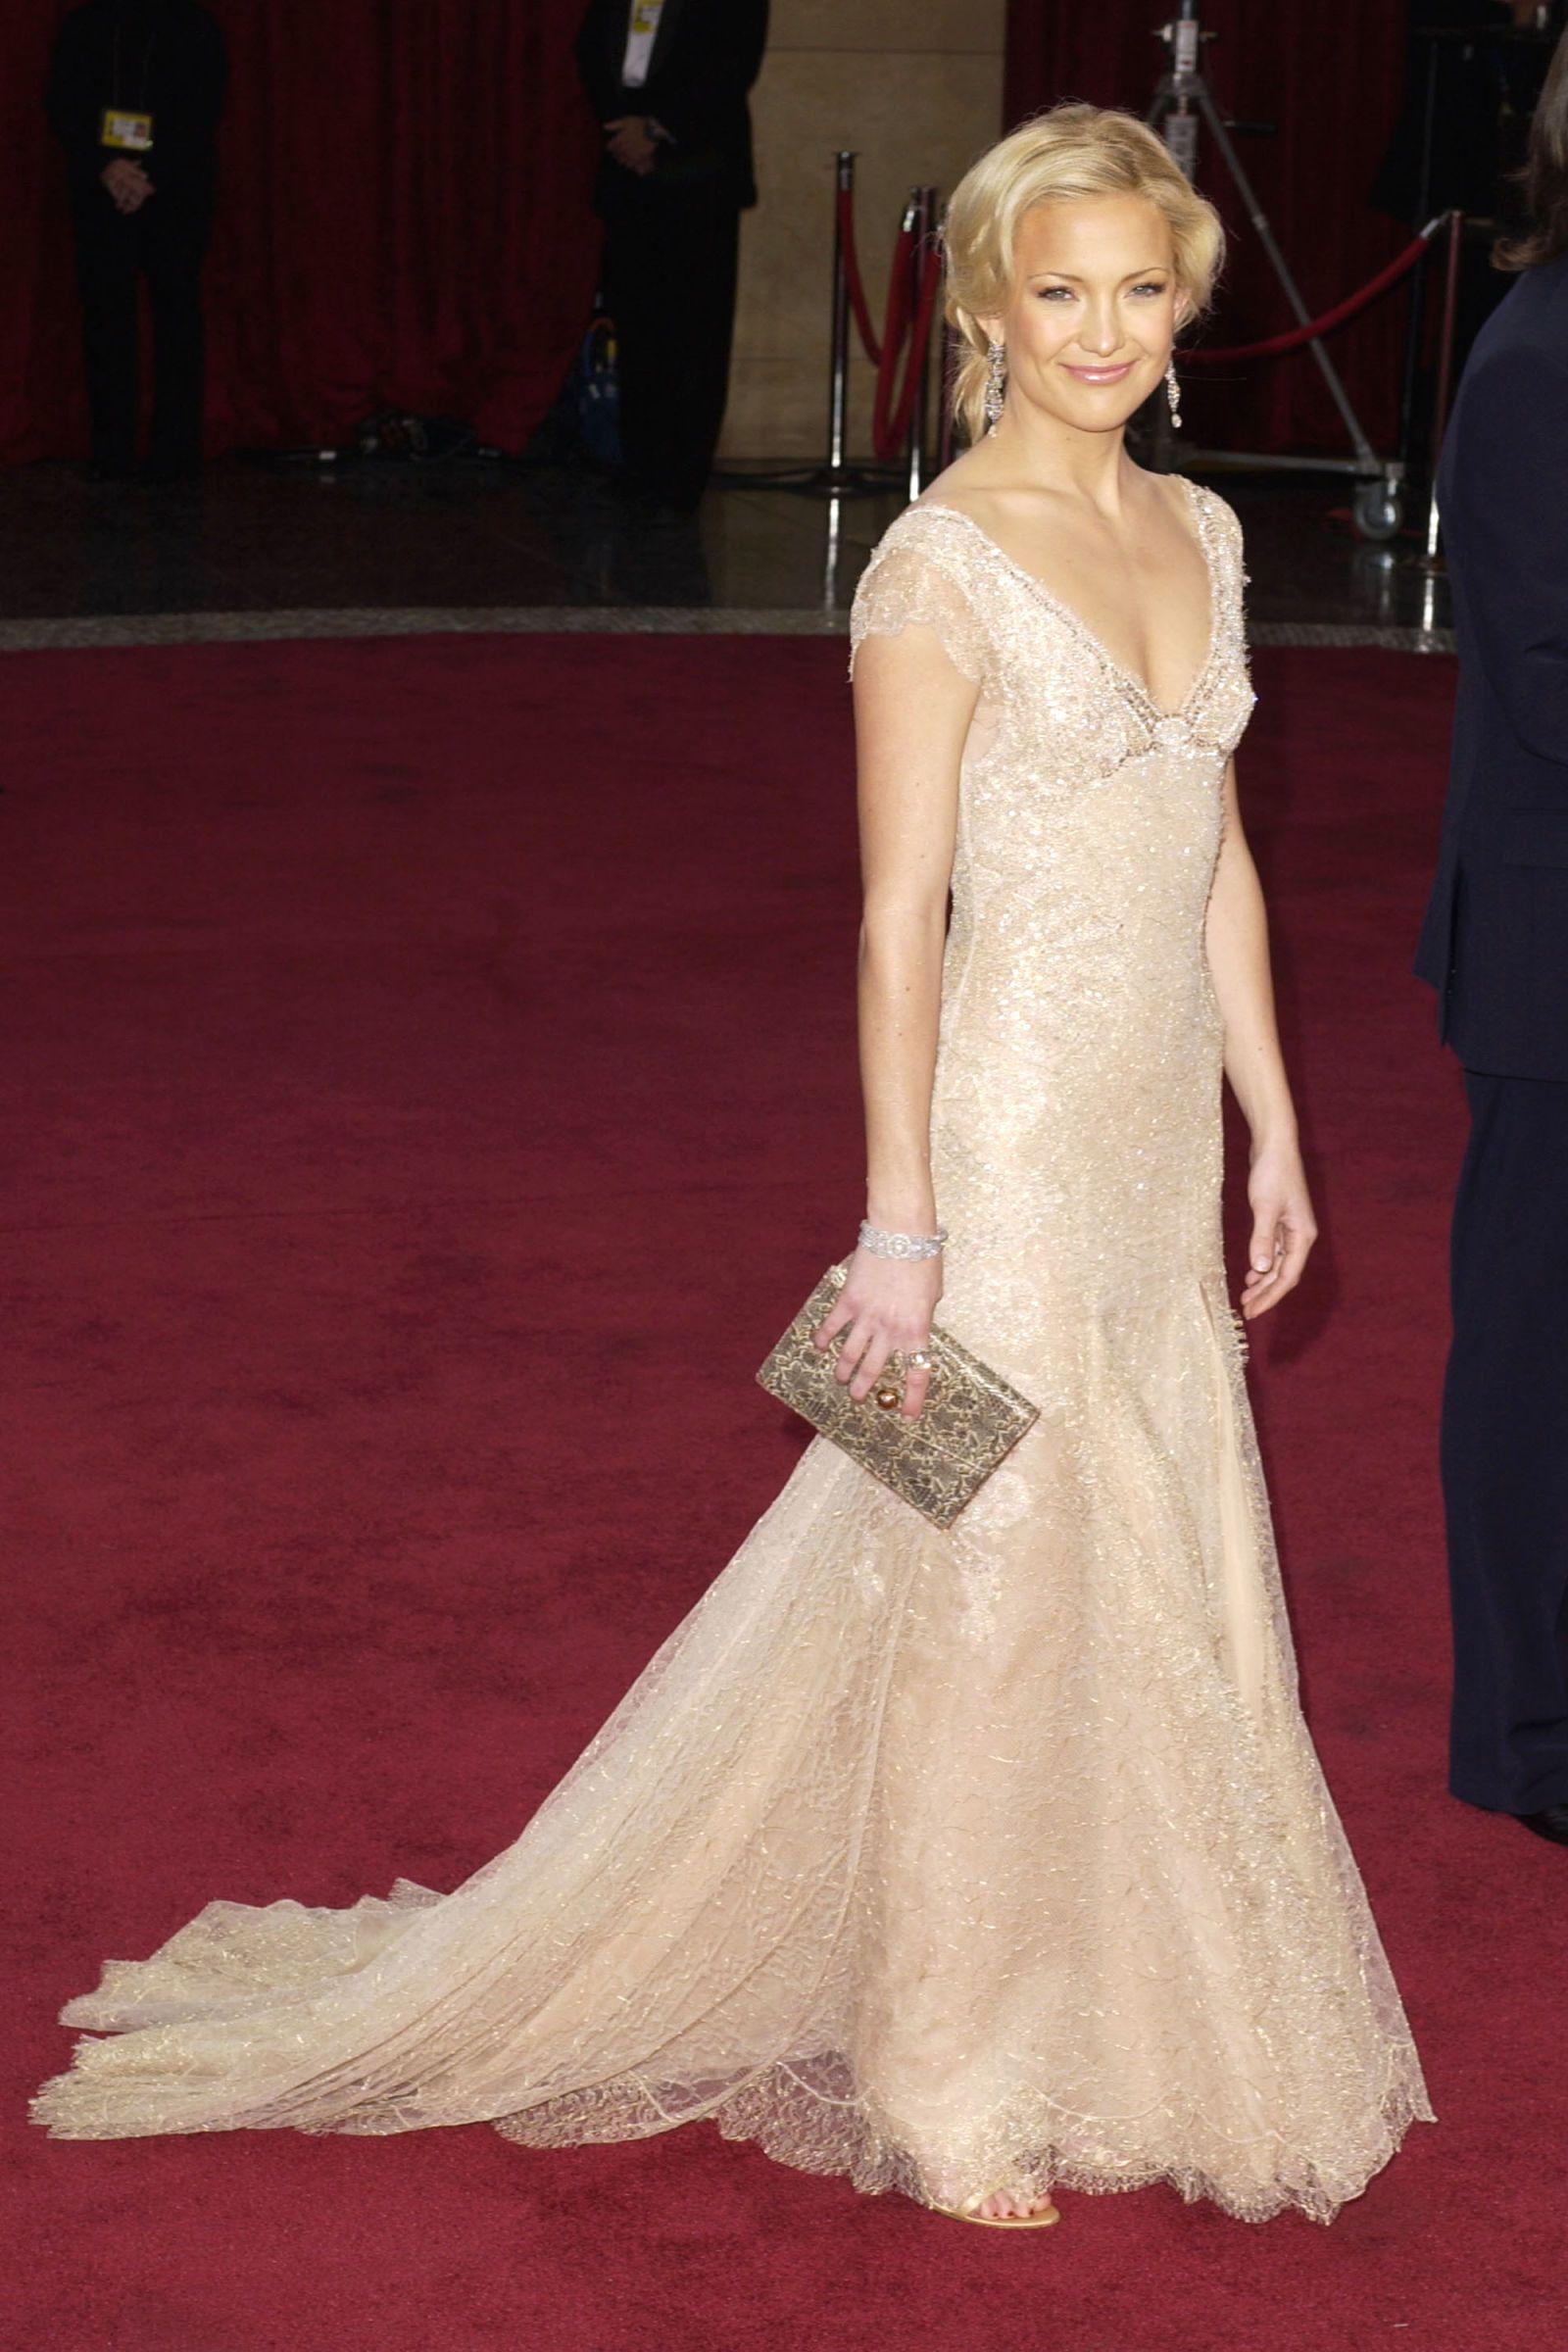 Kate Hudson Best Looks - Kate Hudson Red Carpet Pictures